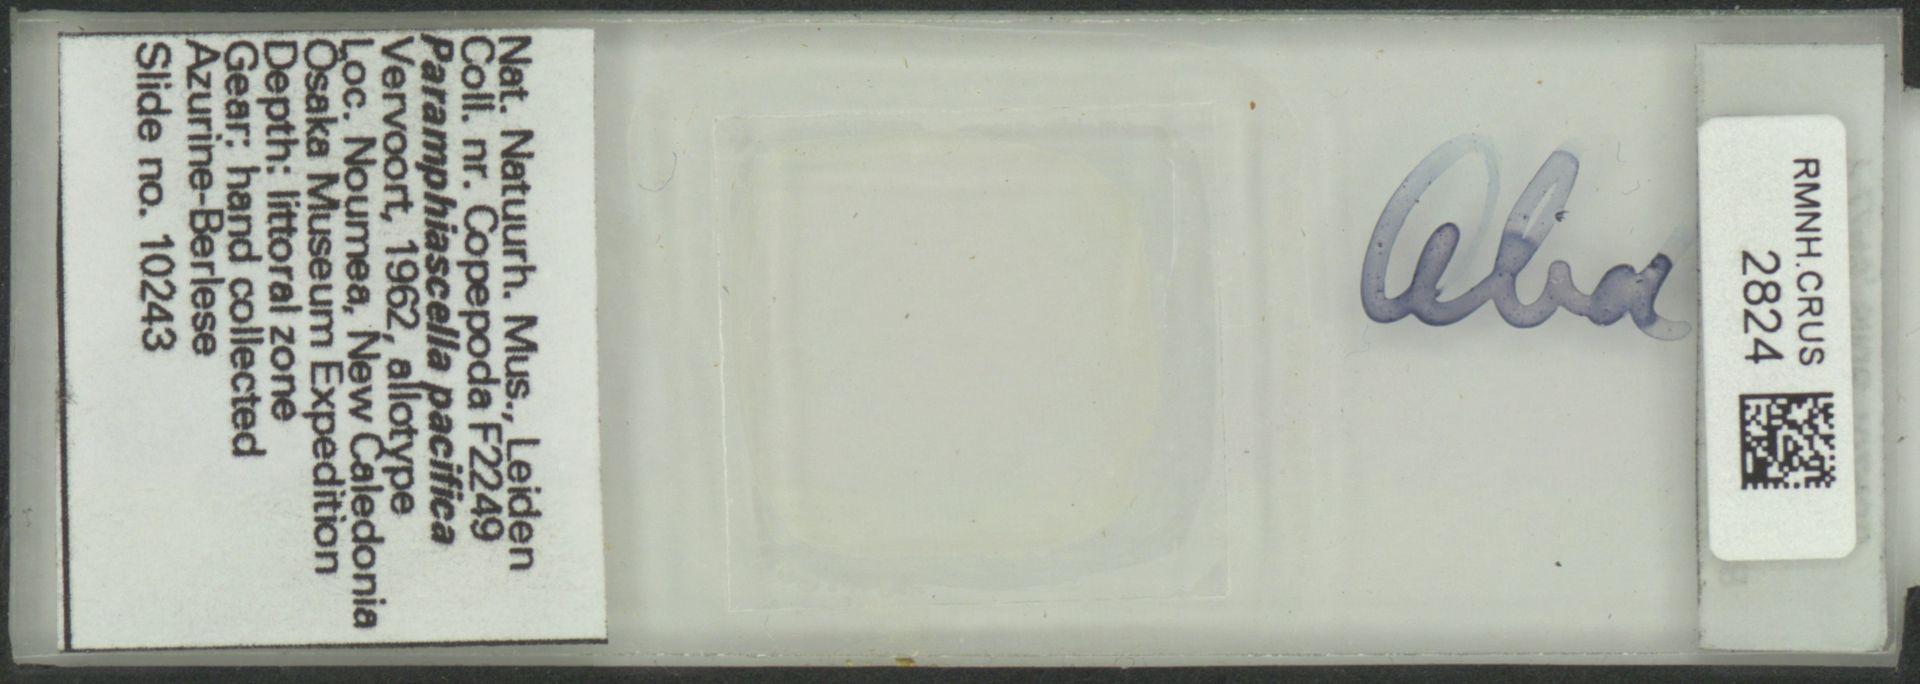 RMNH.CRUS.2824 | Paramphiascella pacifica Vervoort, 1962